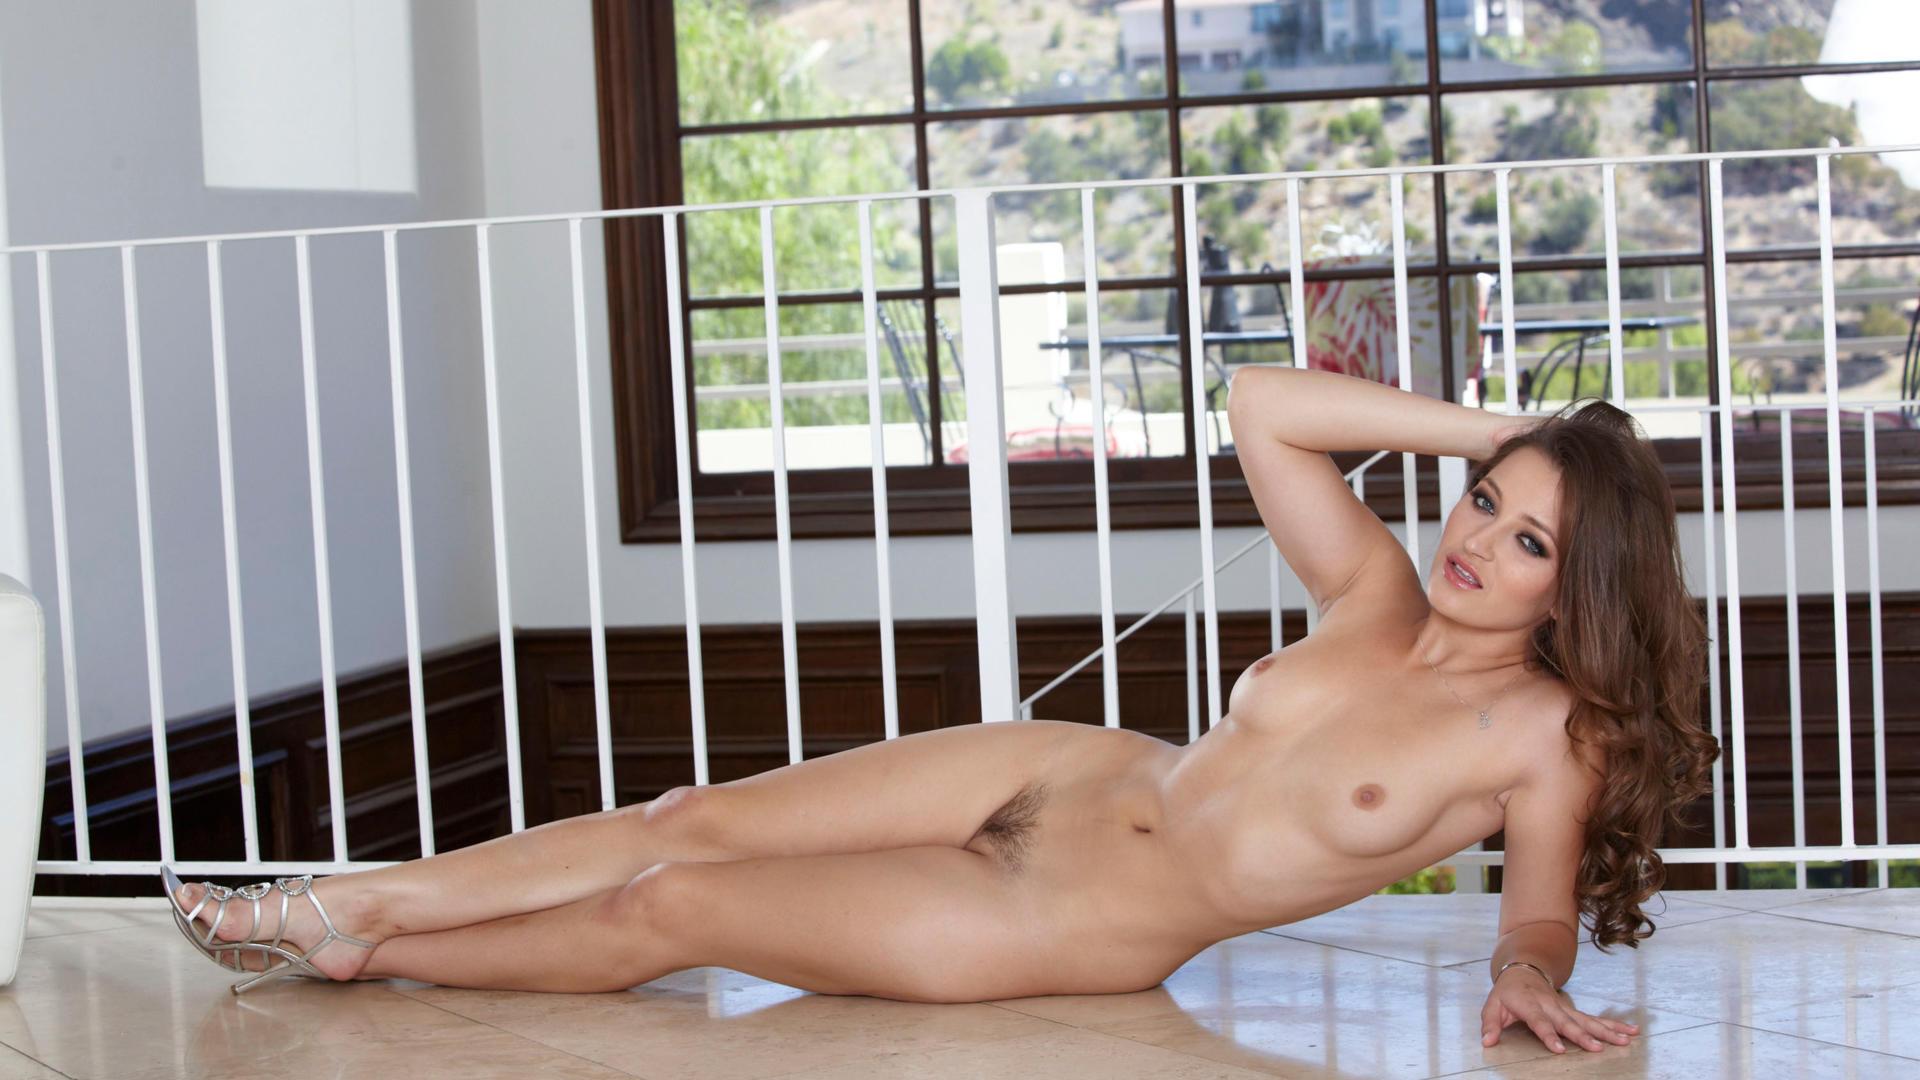 Dani daniels hot nude